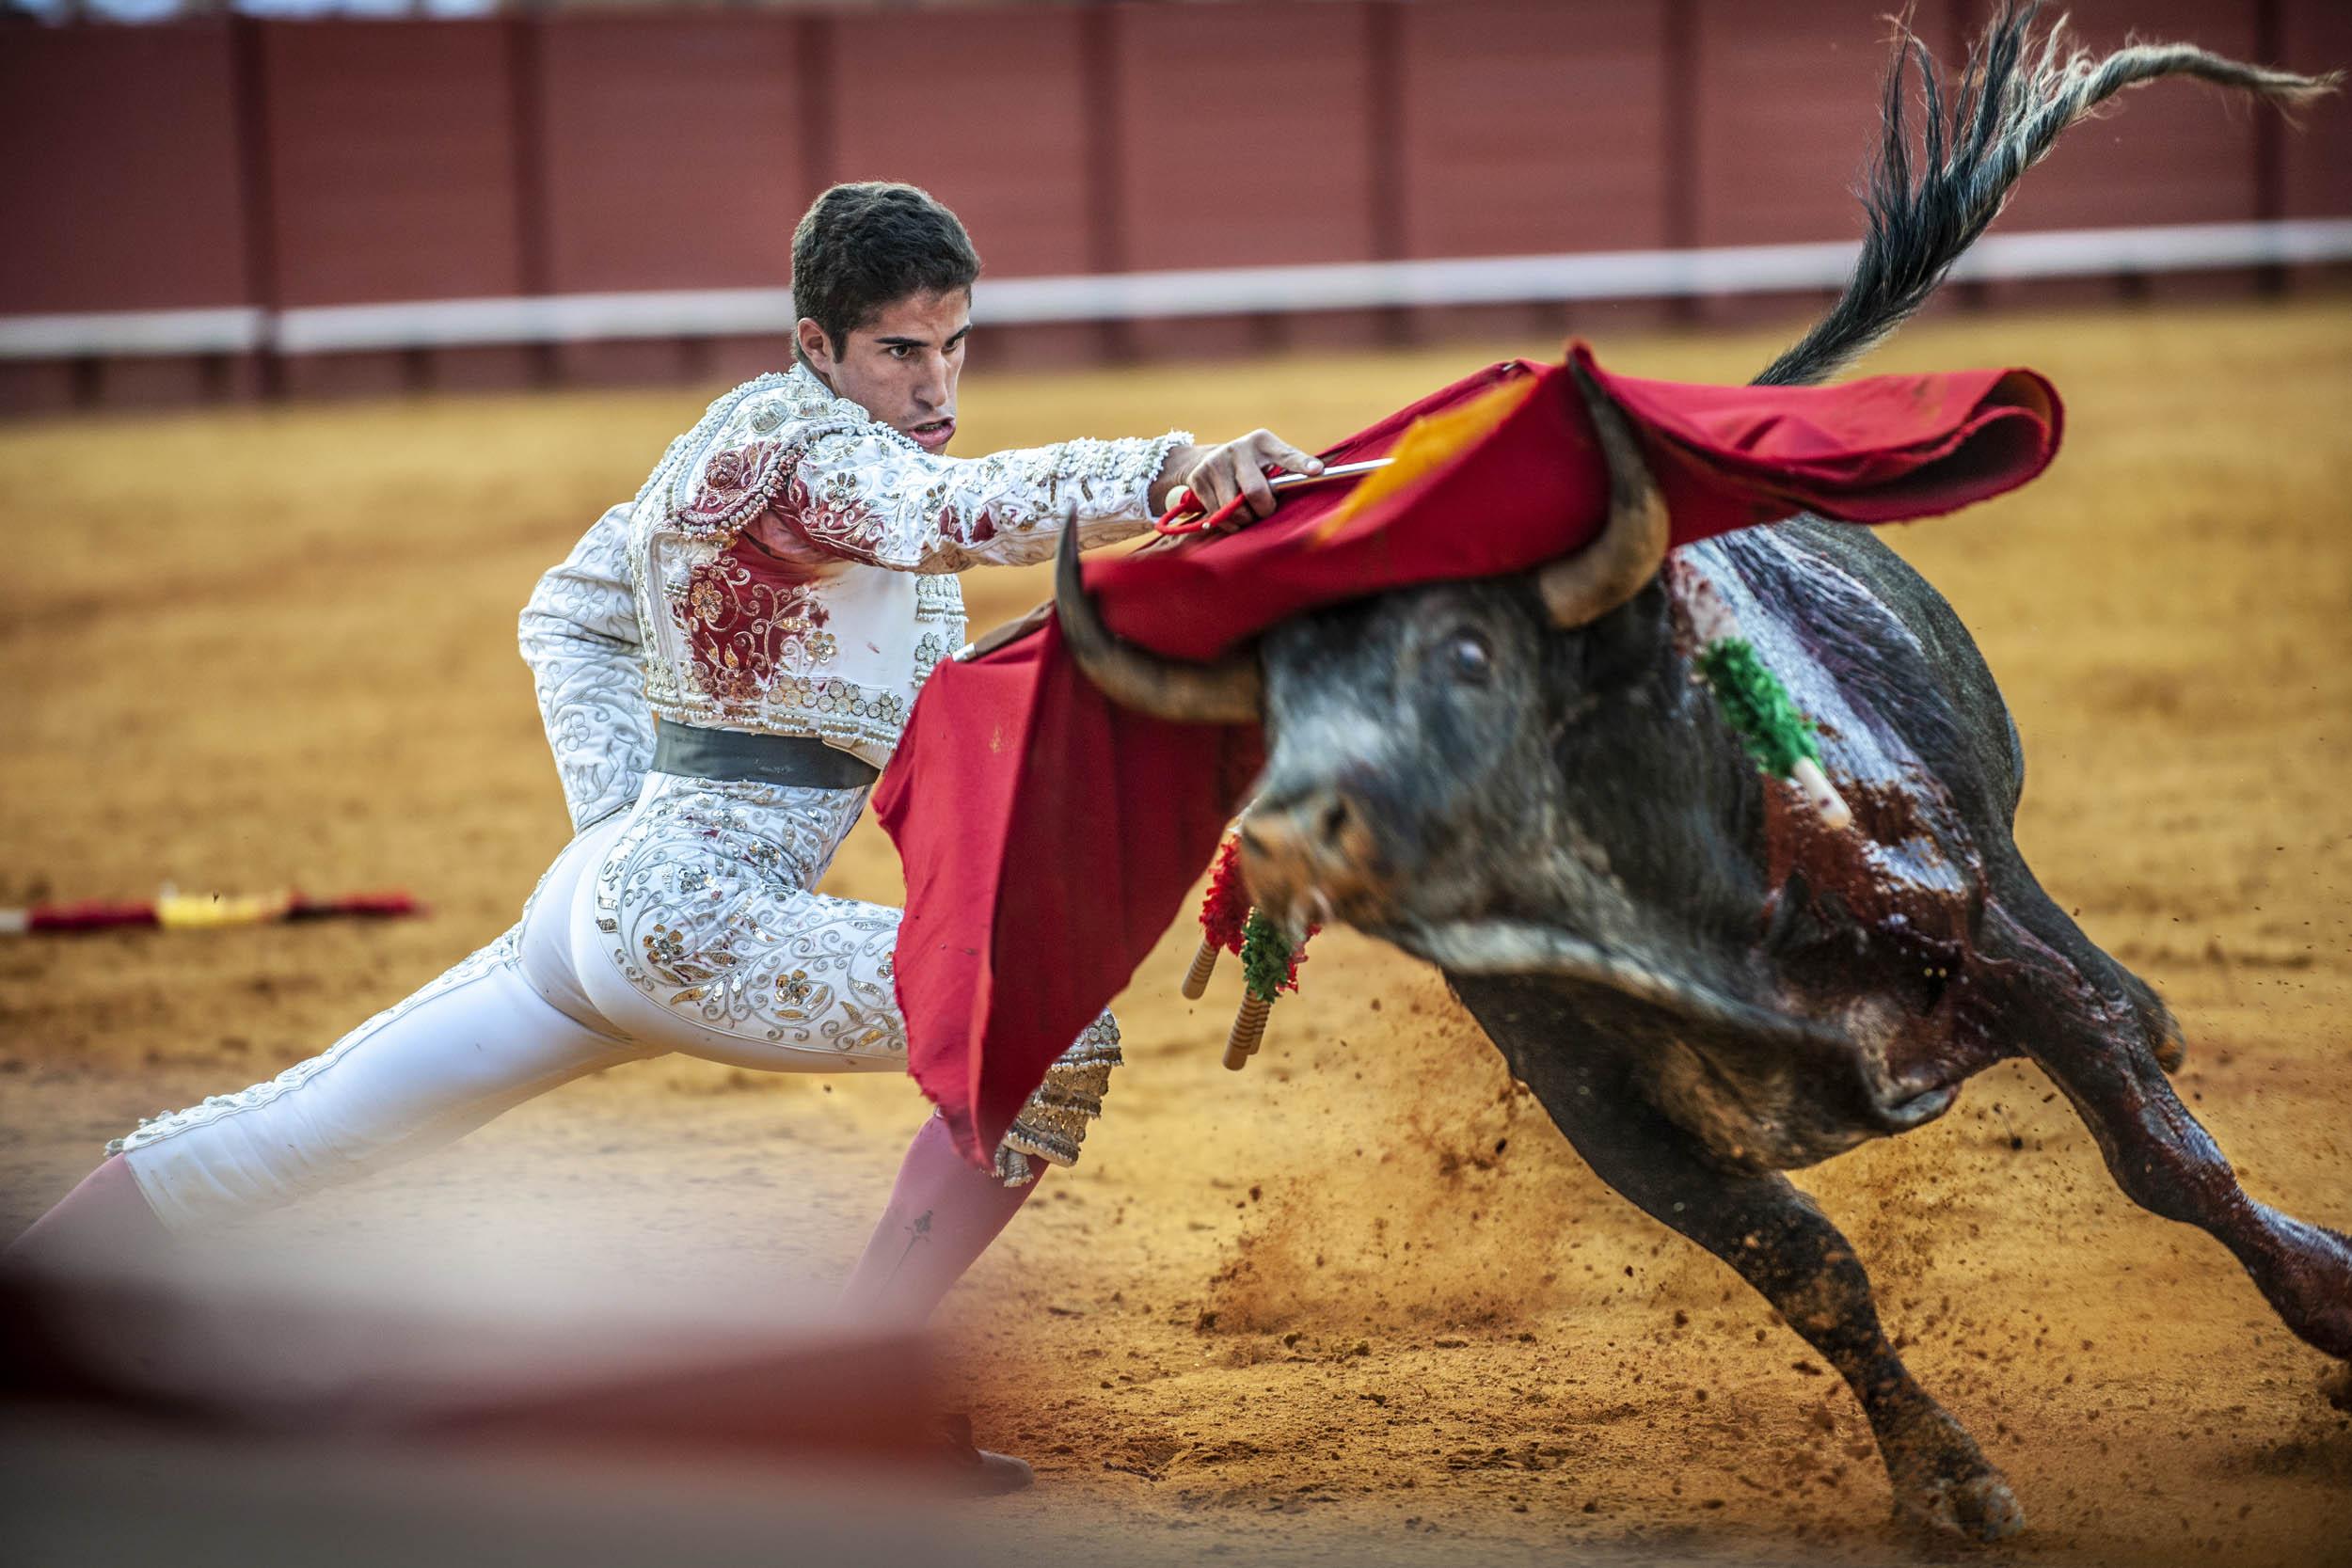 Desigual - Ethnoland - Hector Garrido, Aerial and human photography